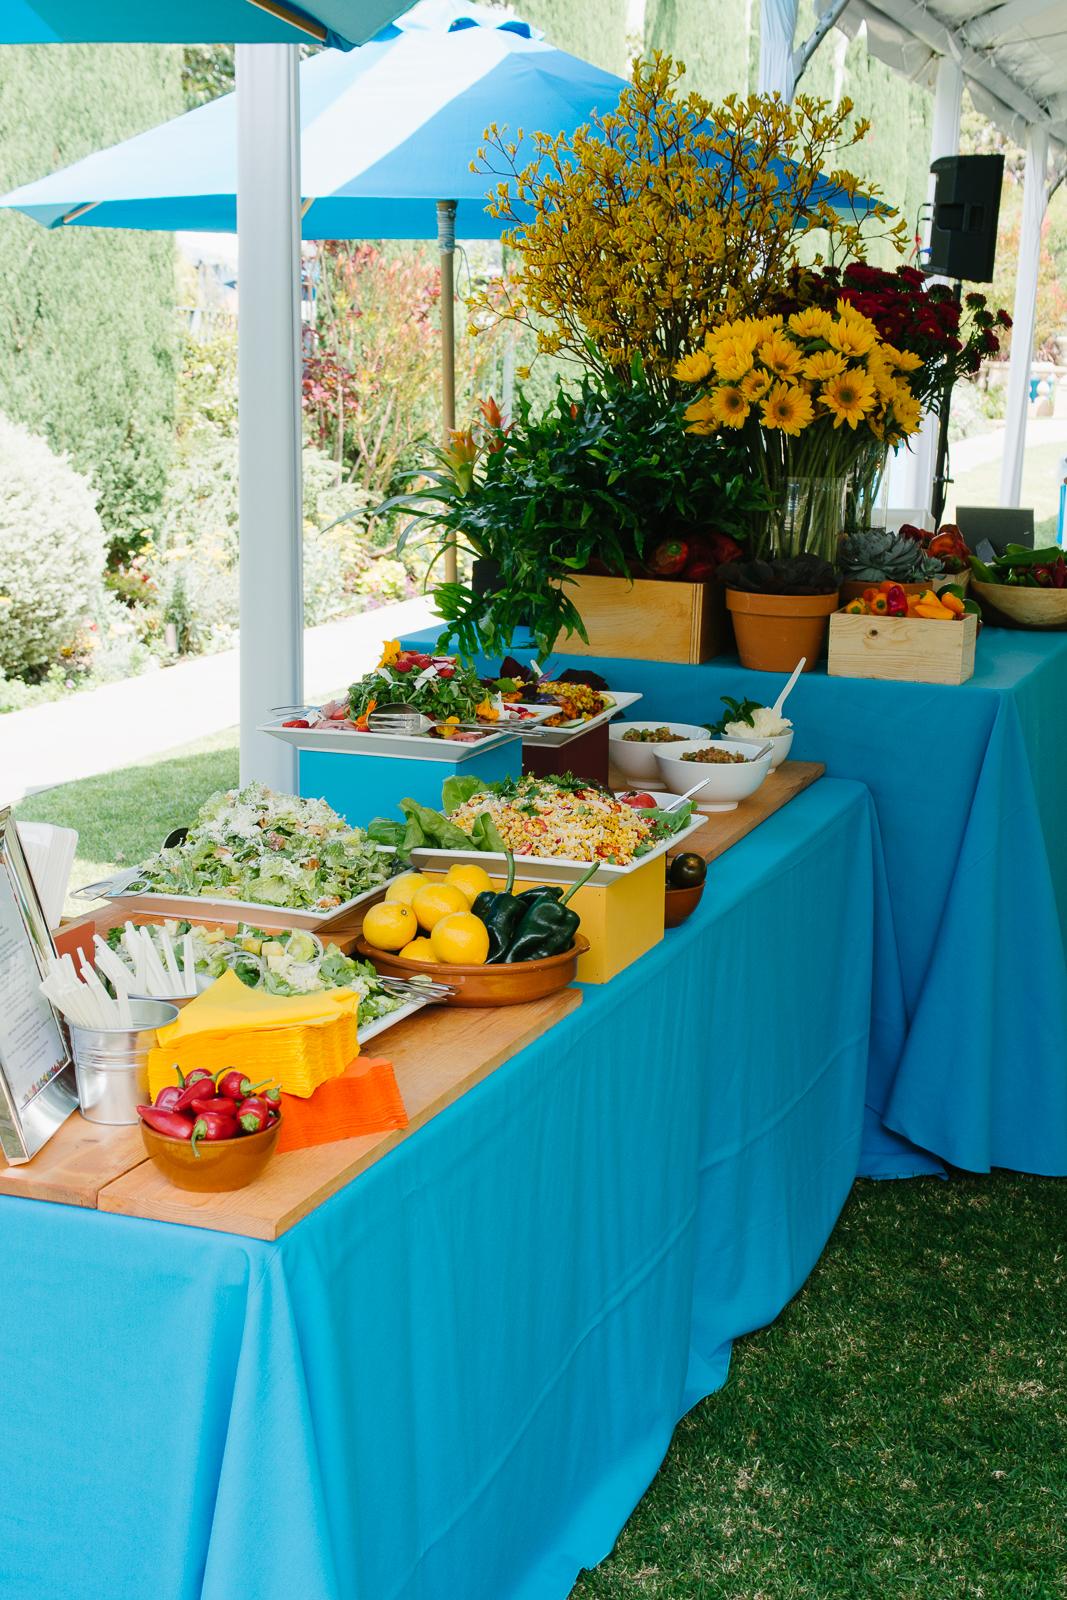 Luncheon display